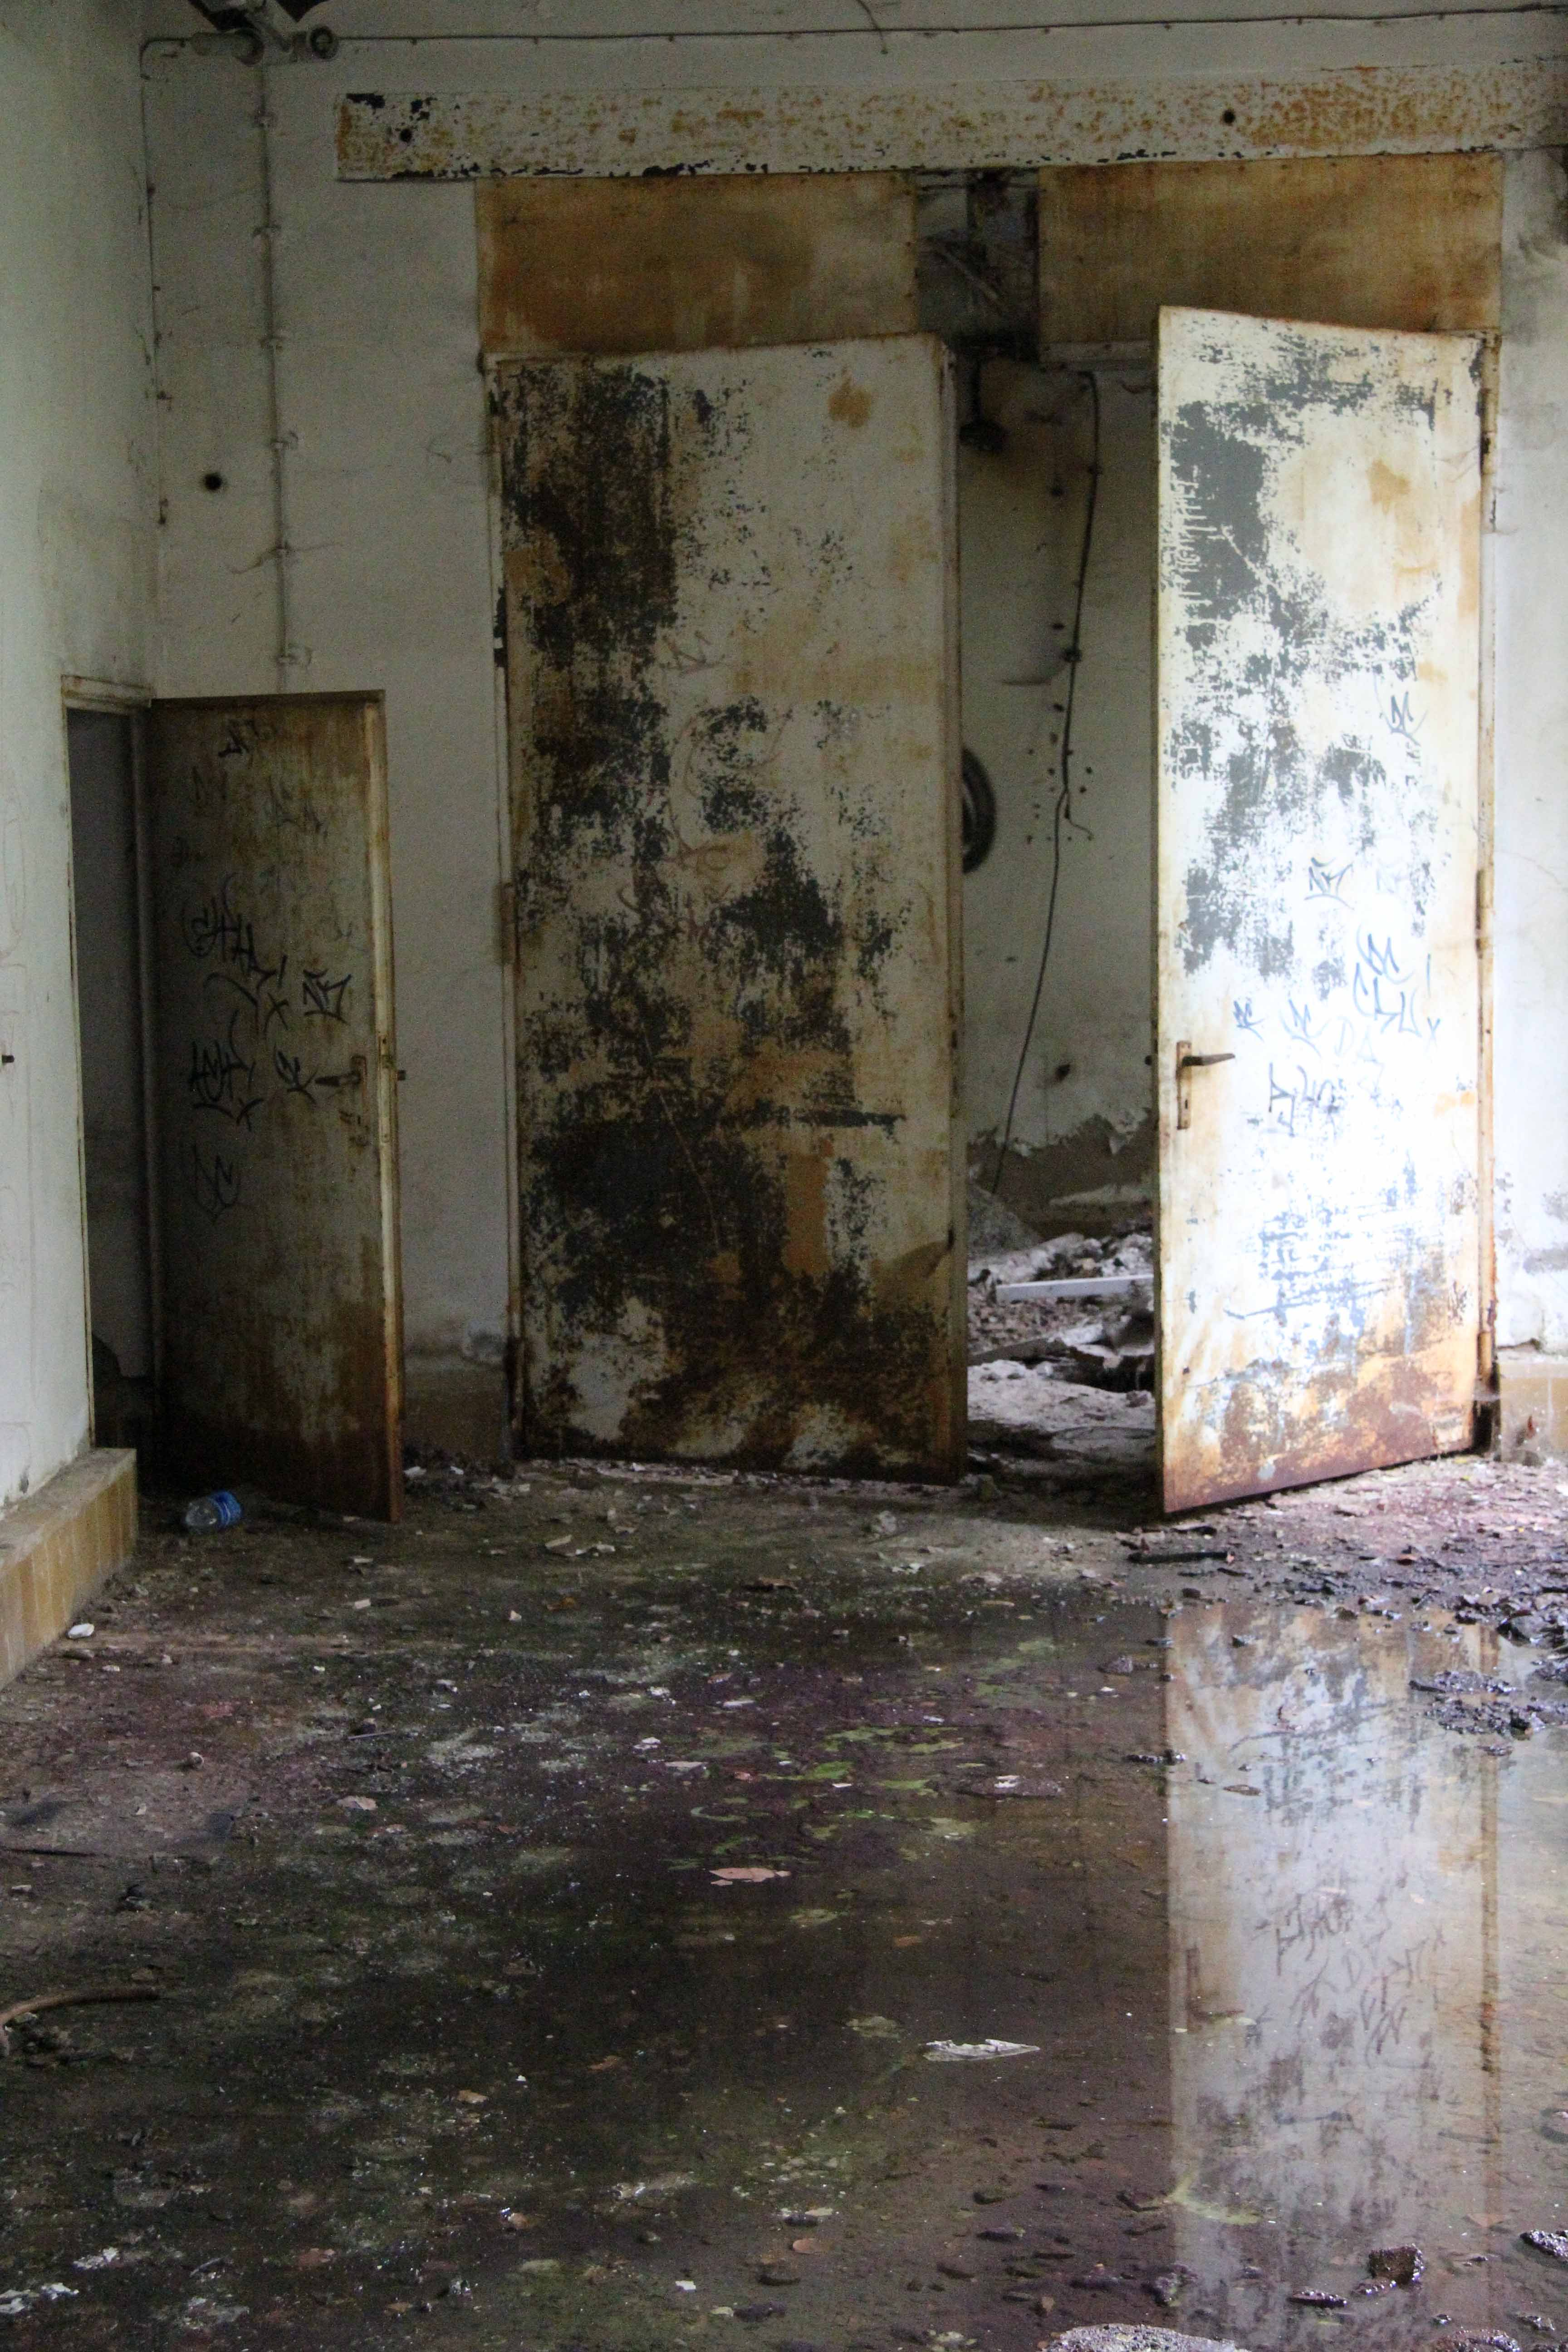 Door and Reflection at Papierfabrik Wolfswinkel, an abandoned paper mill near Berlin